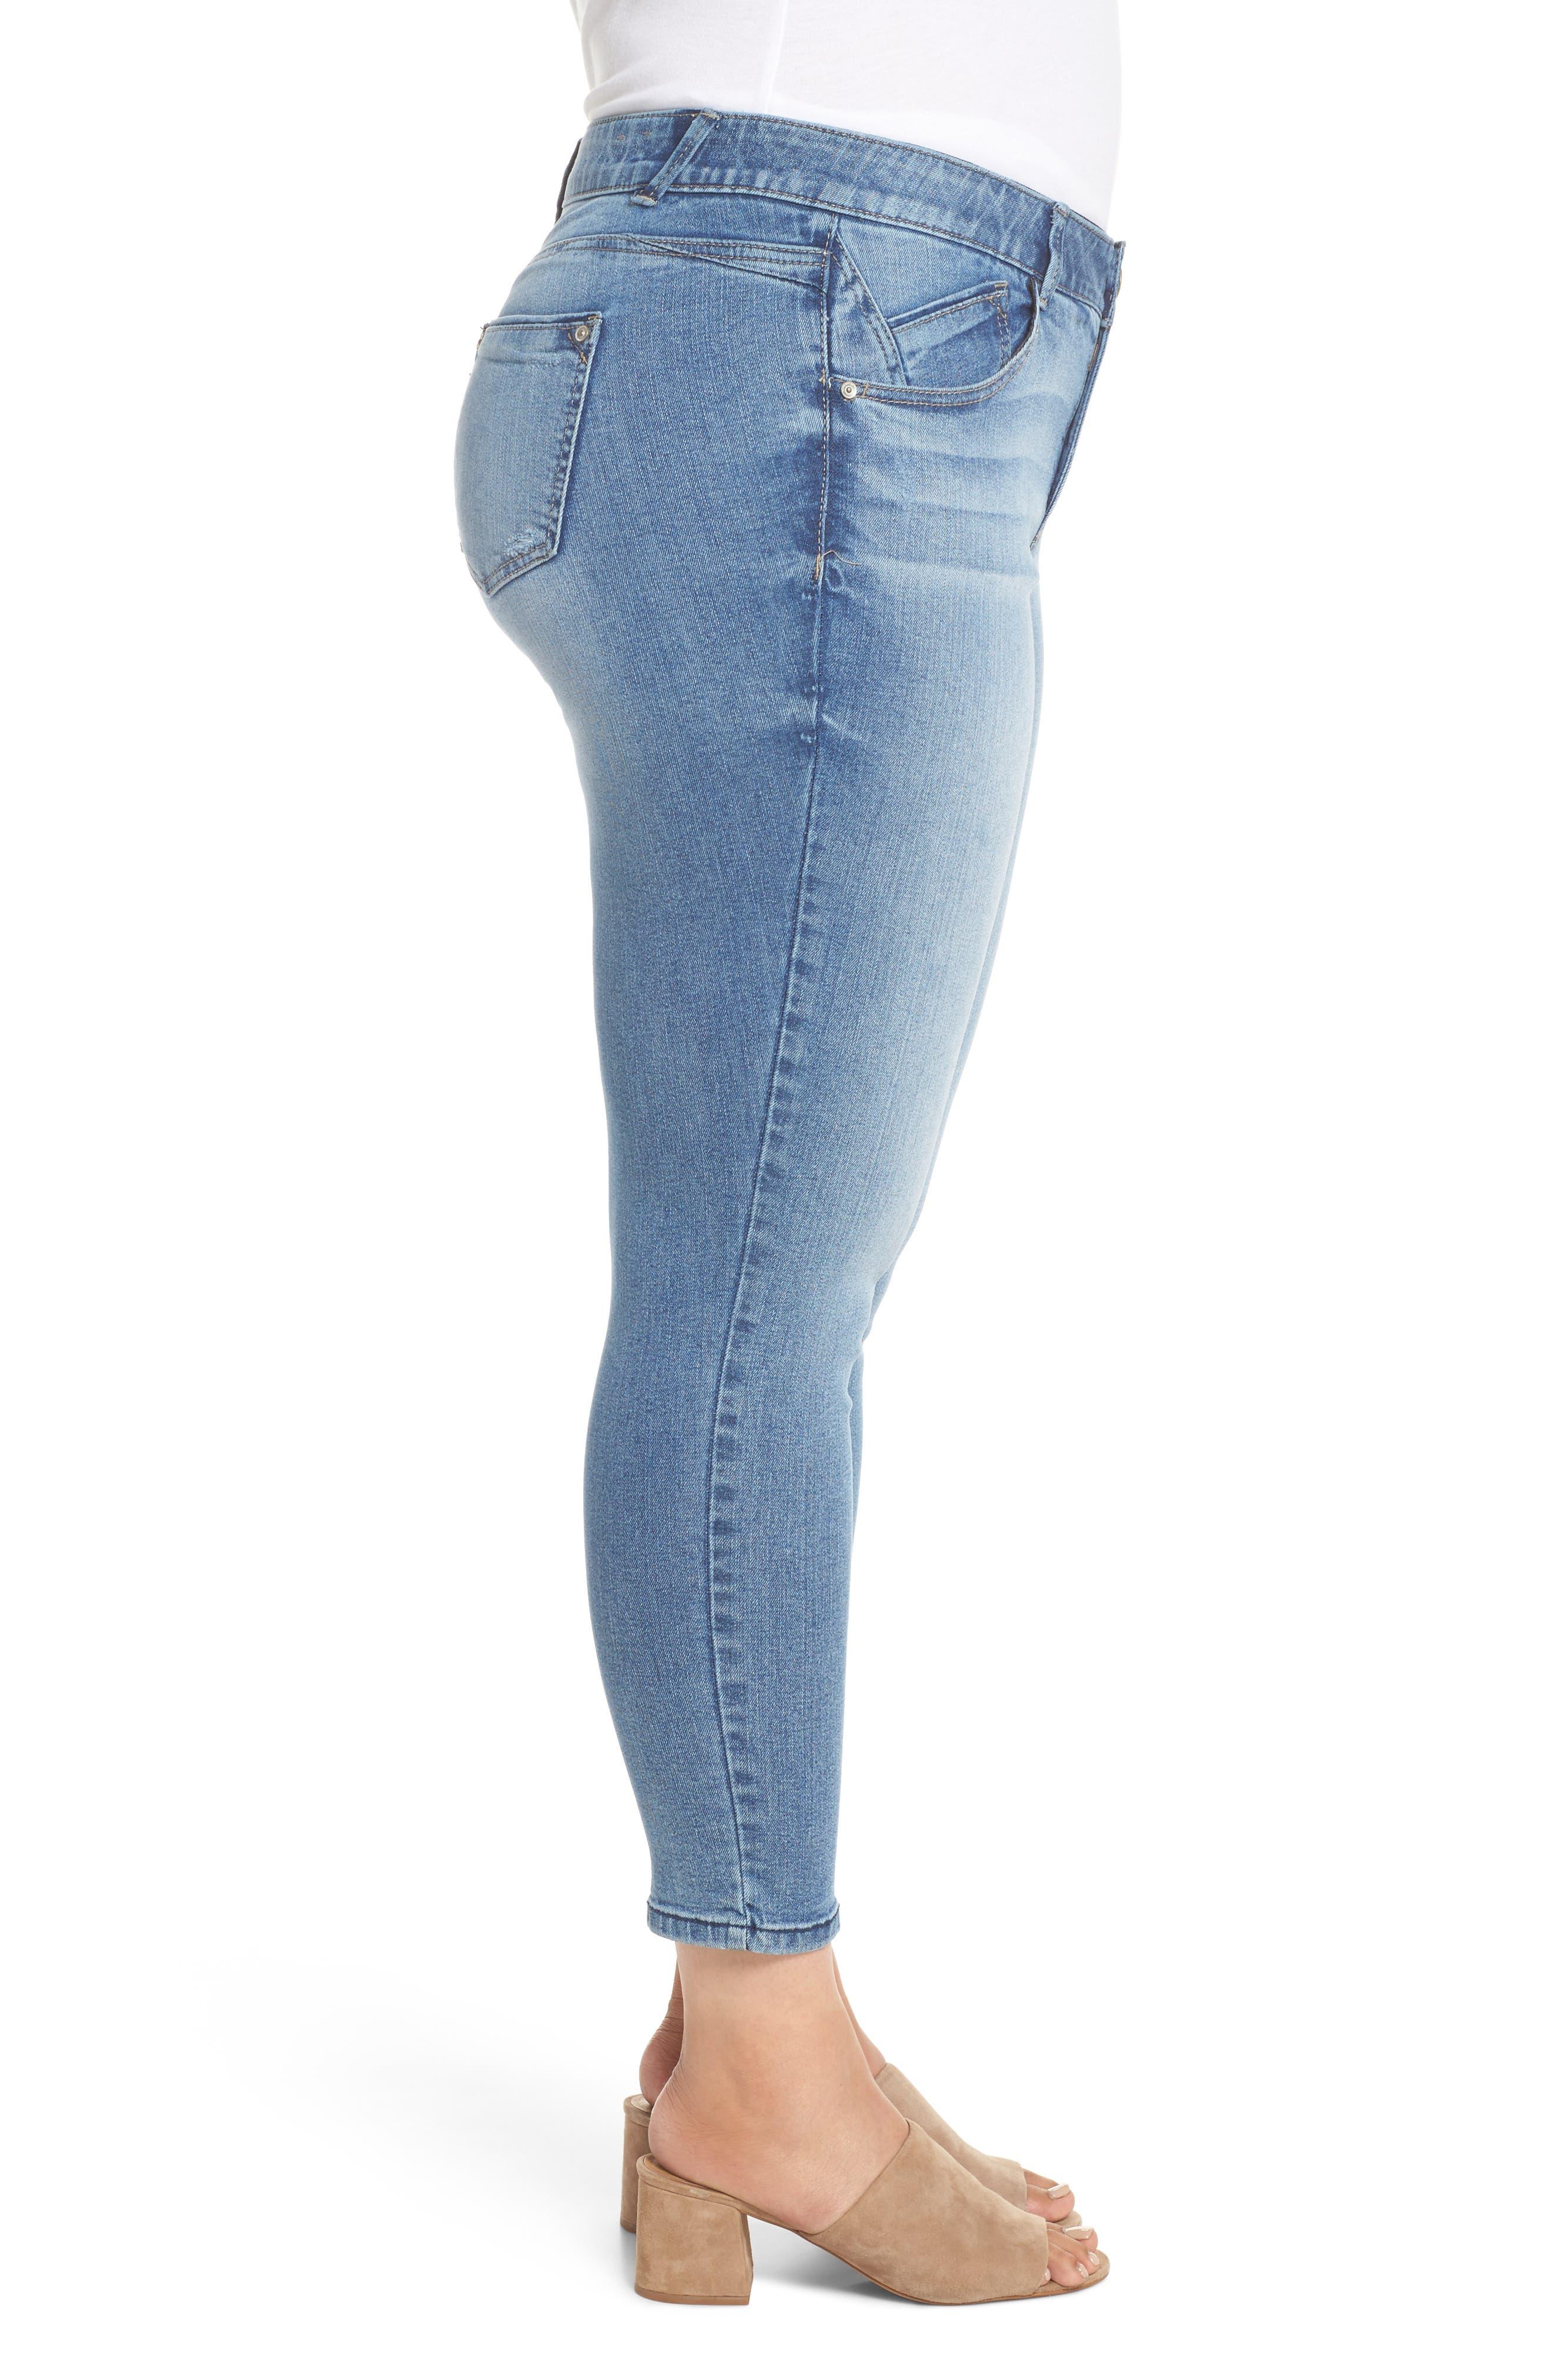 Ab-solution Stretch Ankle Skimmer Jeans,                             Alternate thumbnail 3, color,                             Light Blue